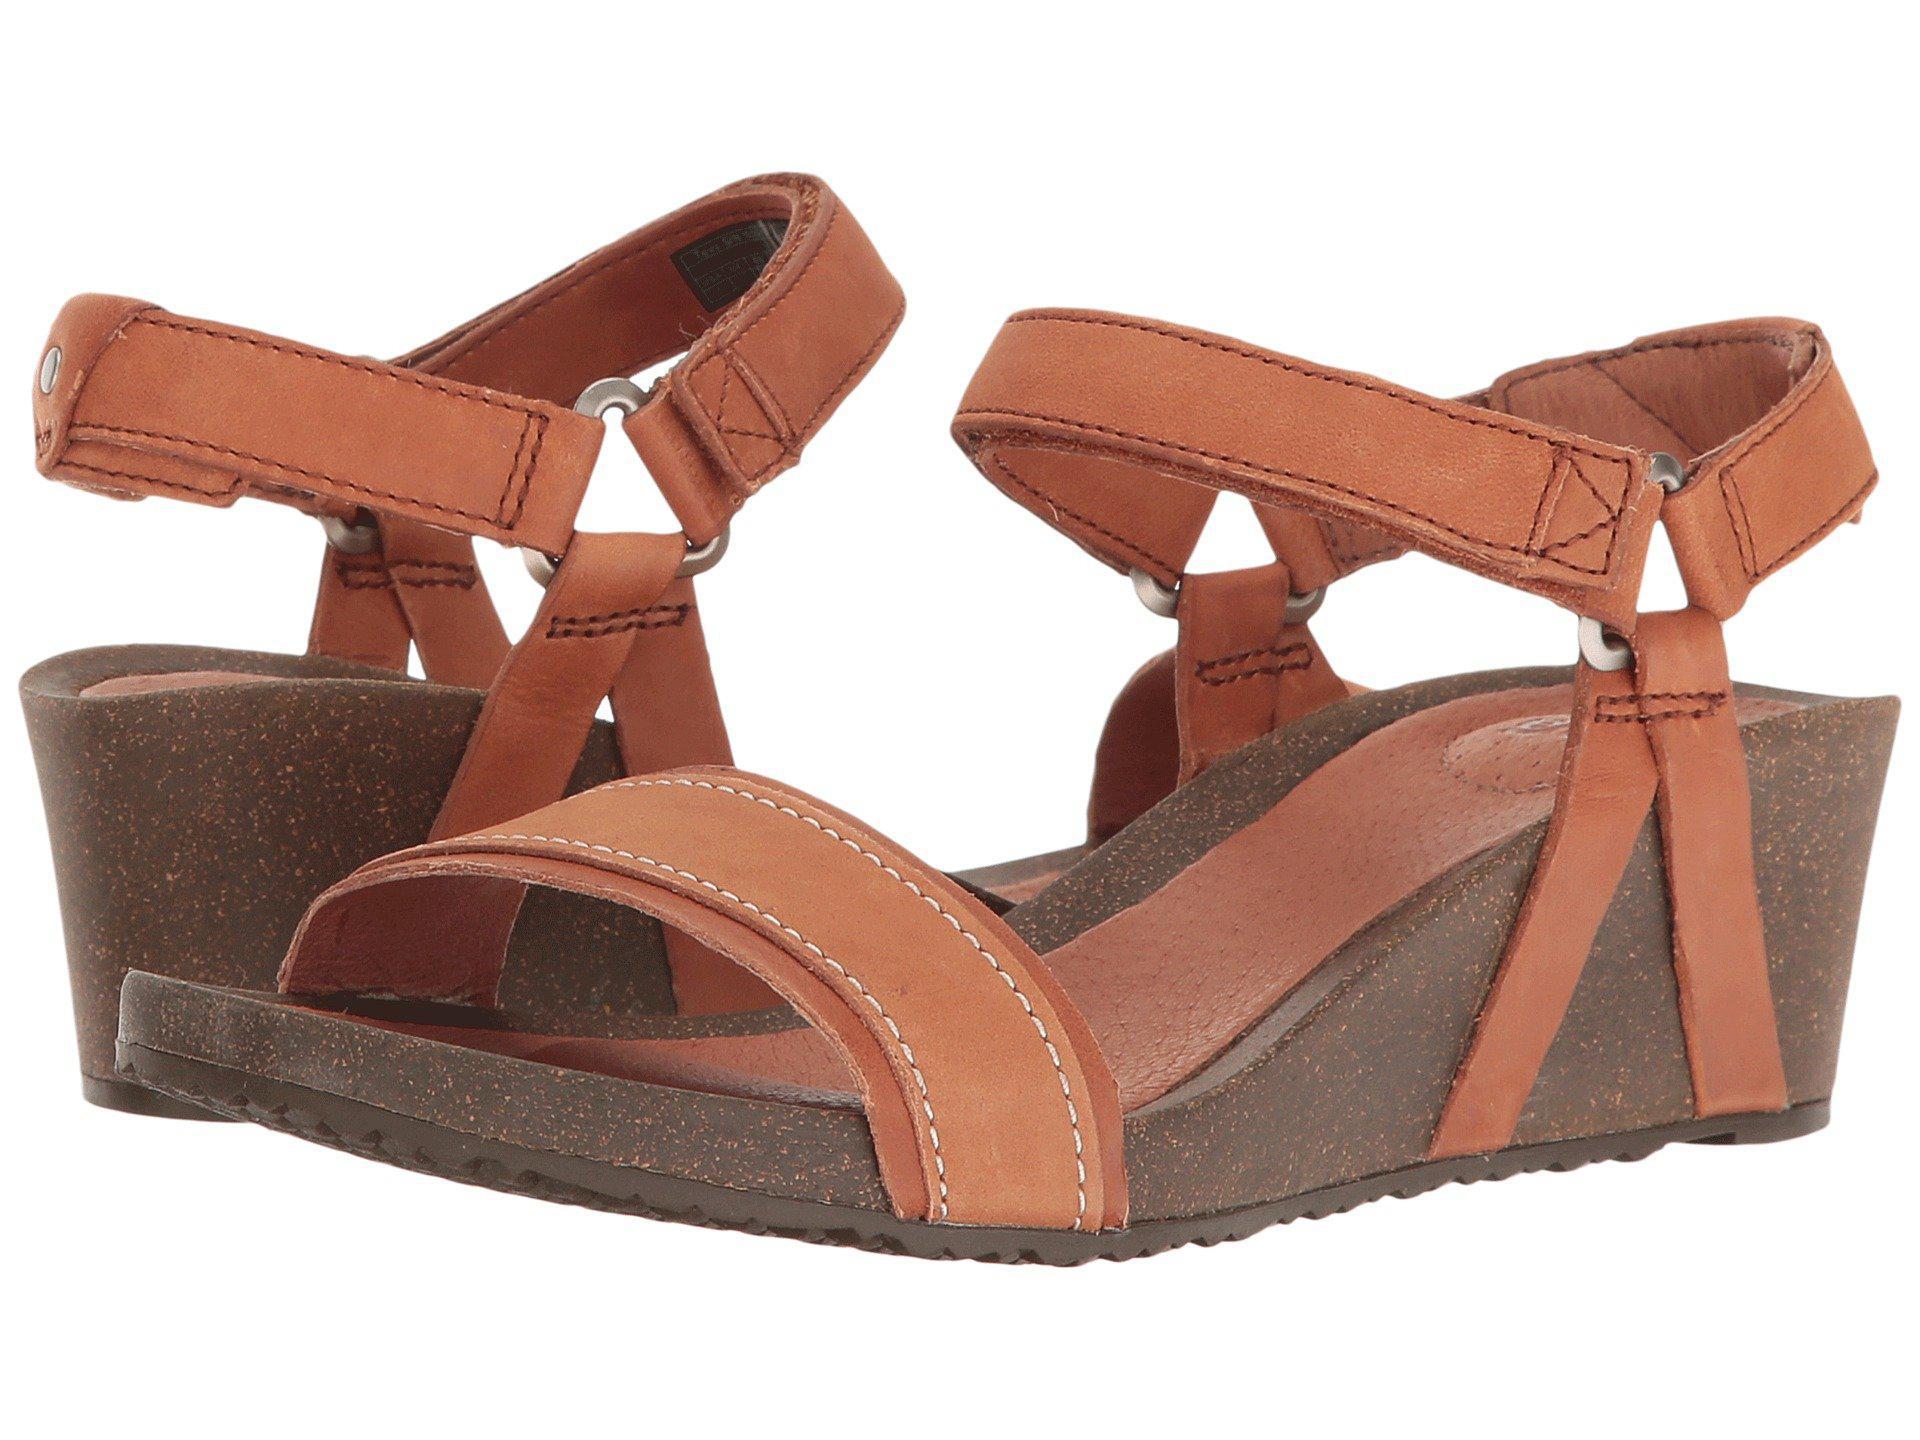 3cedaa25624 Lyst - Teva Ysidro Stitch Wedge Sandals in Brown